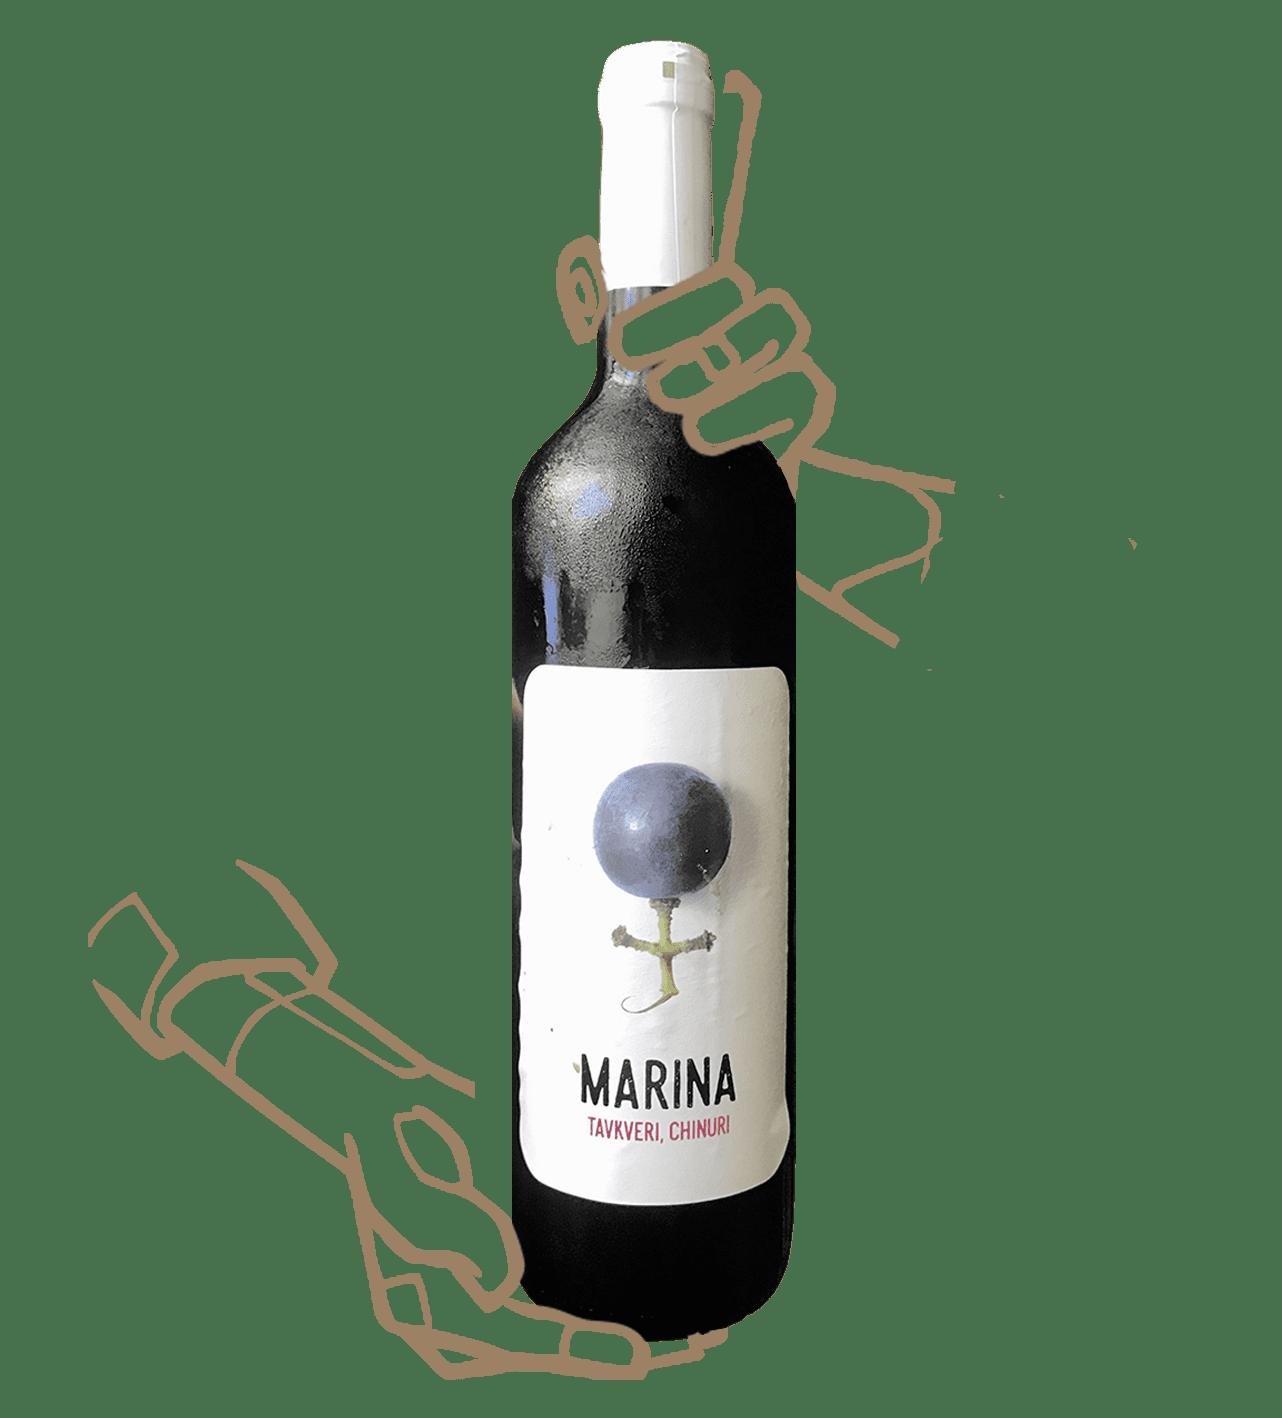 MARINA ROSé de IAGO'S WINE est un vin naturel de Géorgie